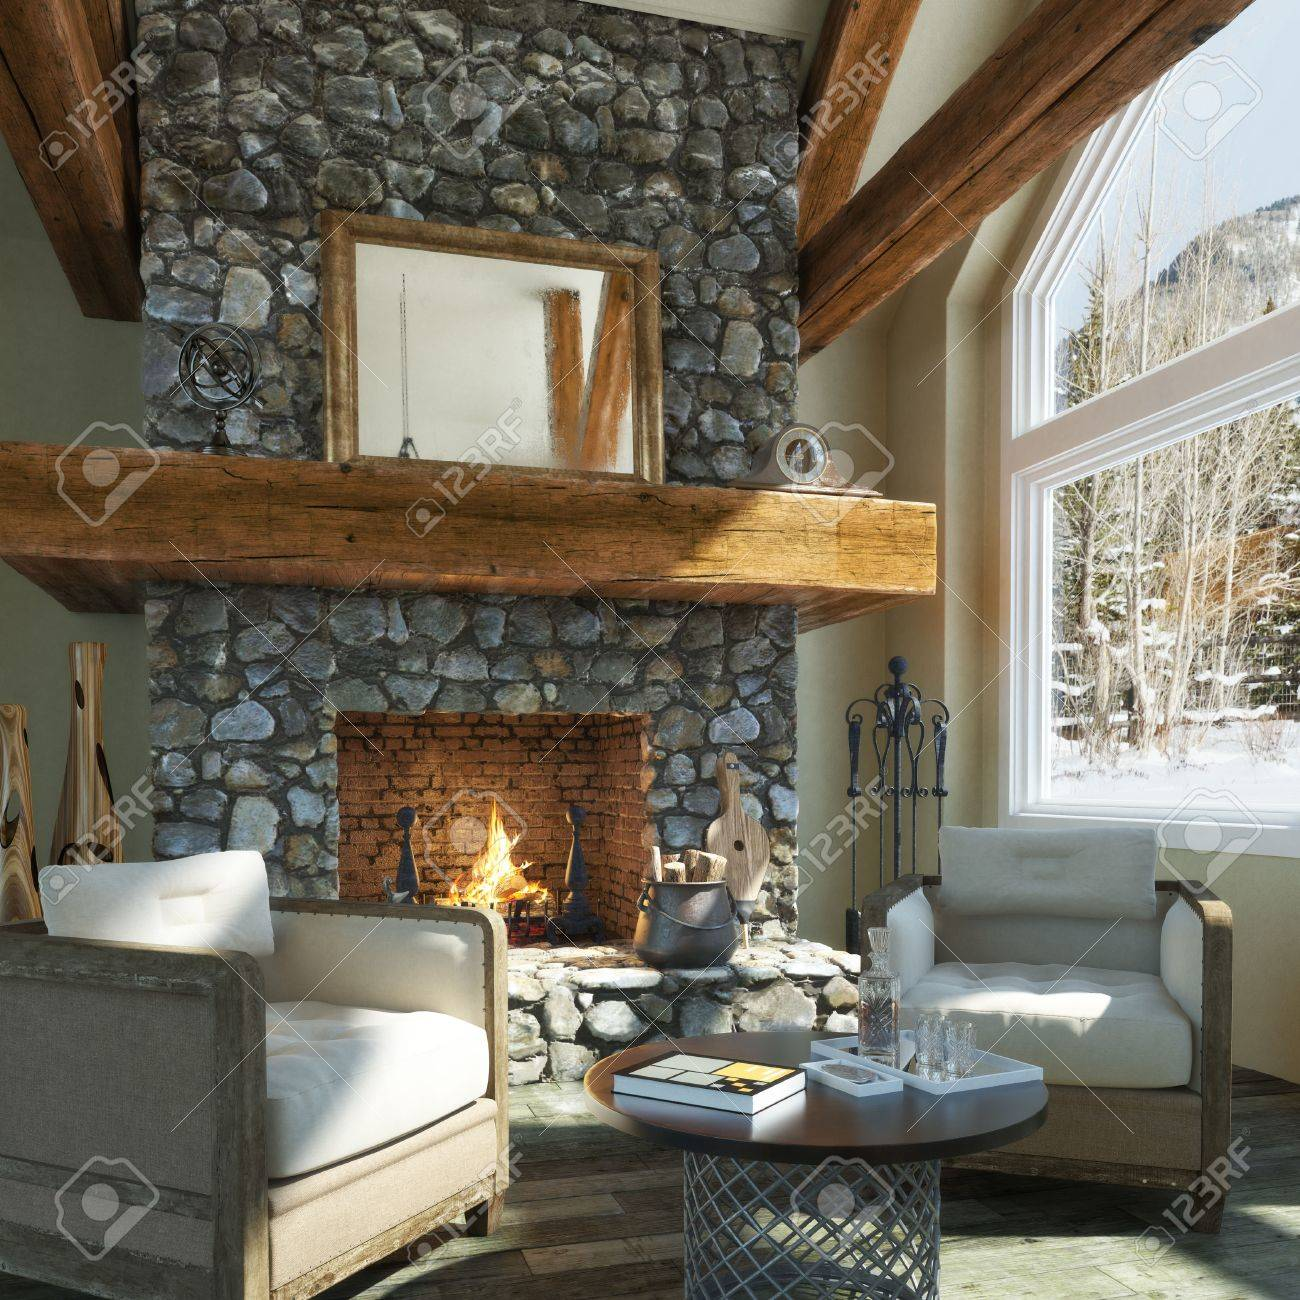 luxurious open floor cabin interior design with roaring fireplace